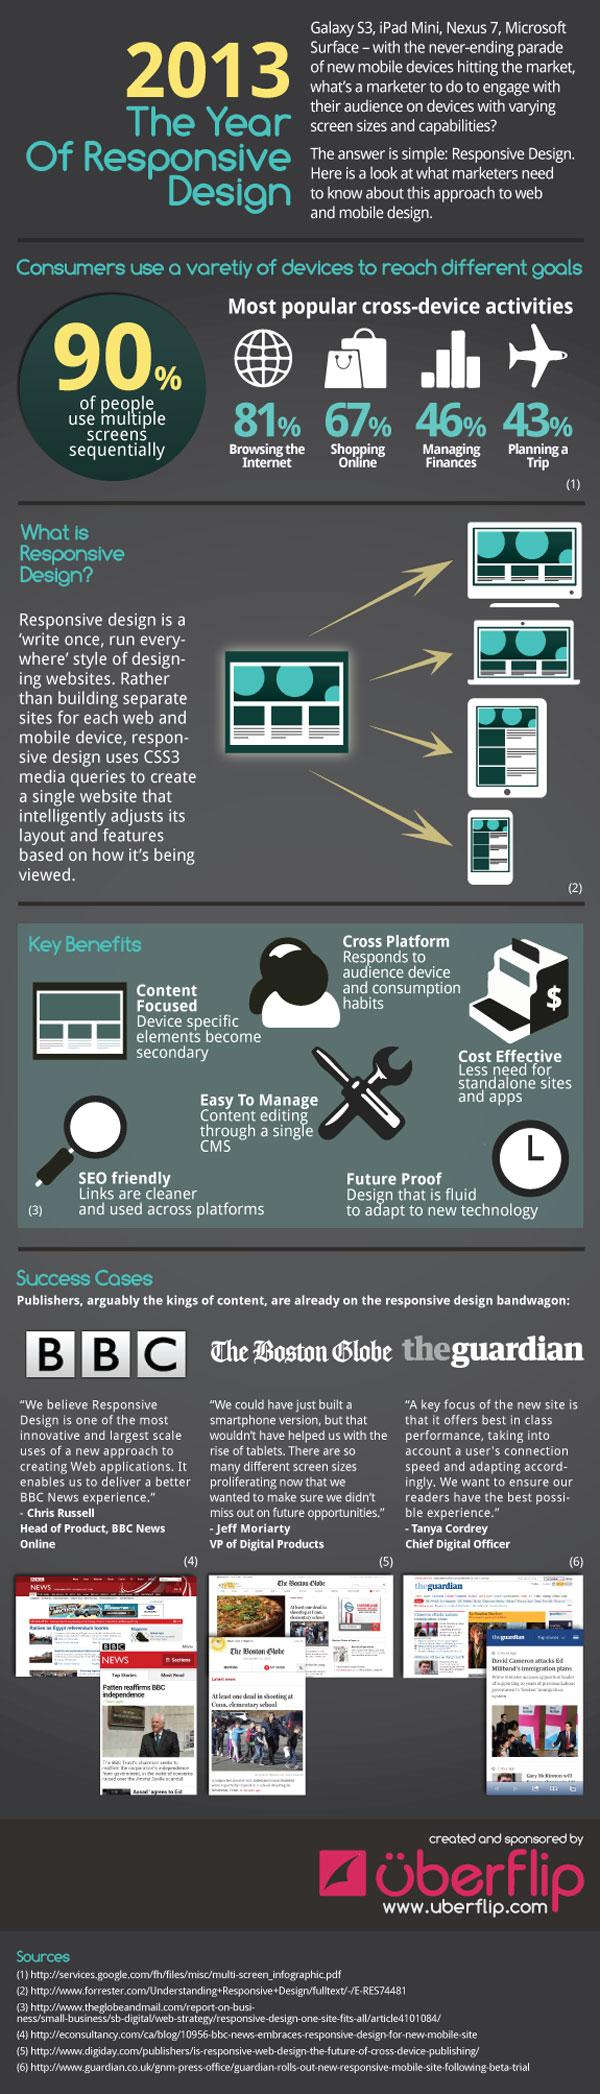 2013-responsive-design-infographic-1